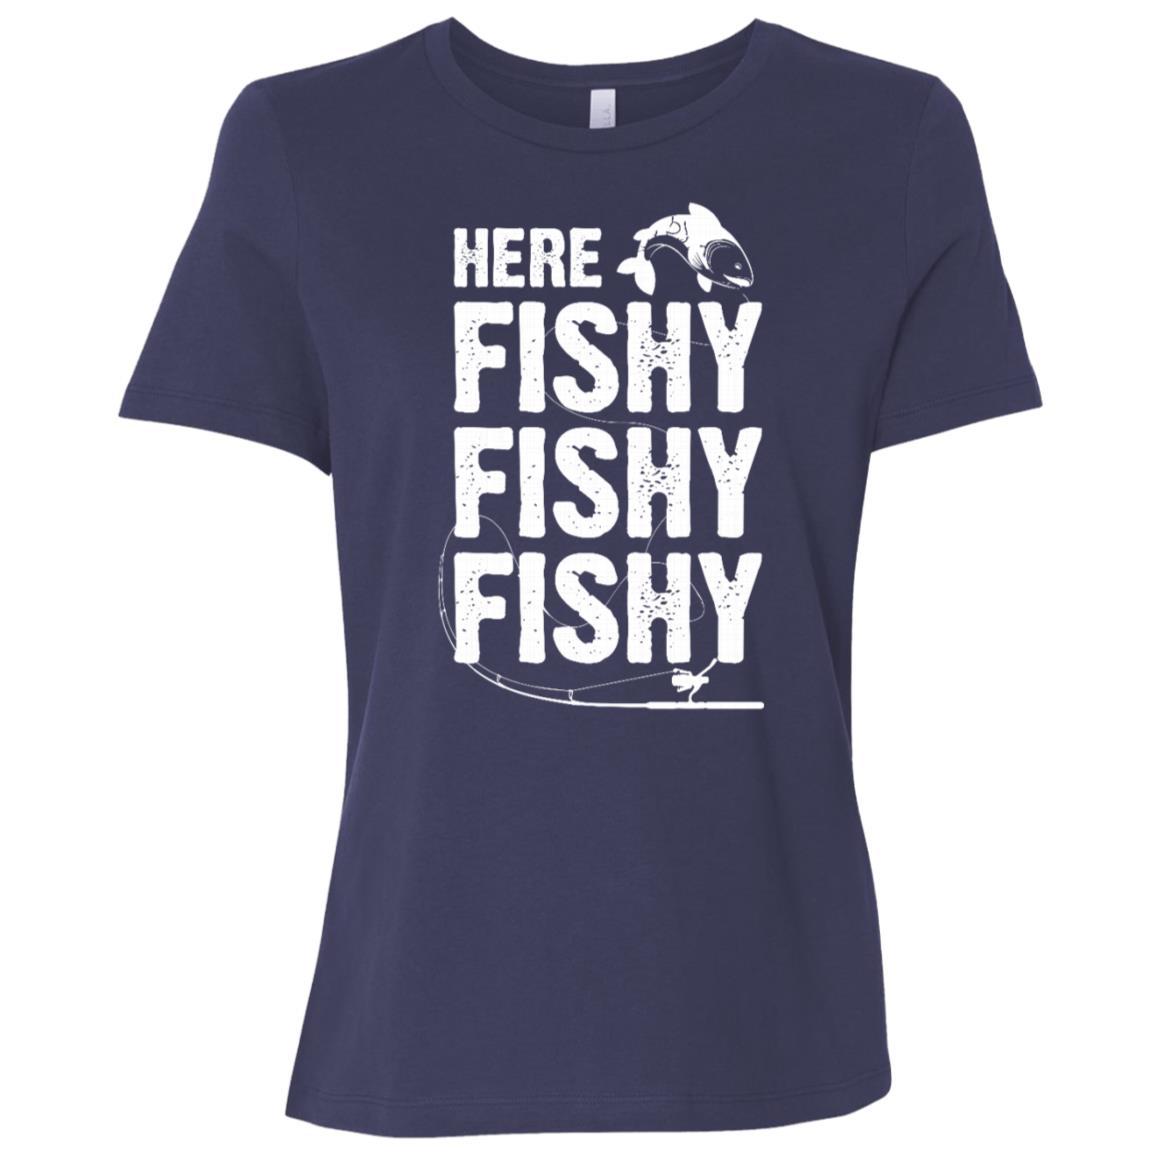 Funny Here Fishy Fishy Fishy Fisherman -2 Women Short Sleeve T-Shirt